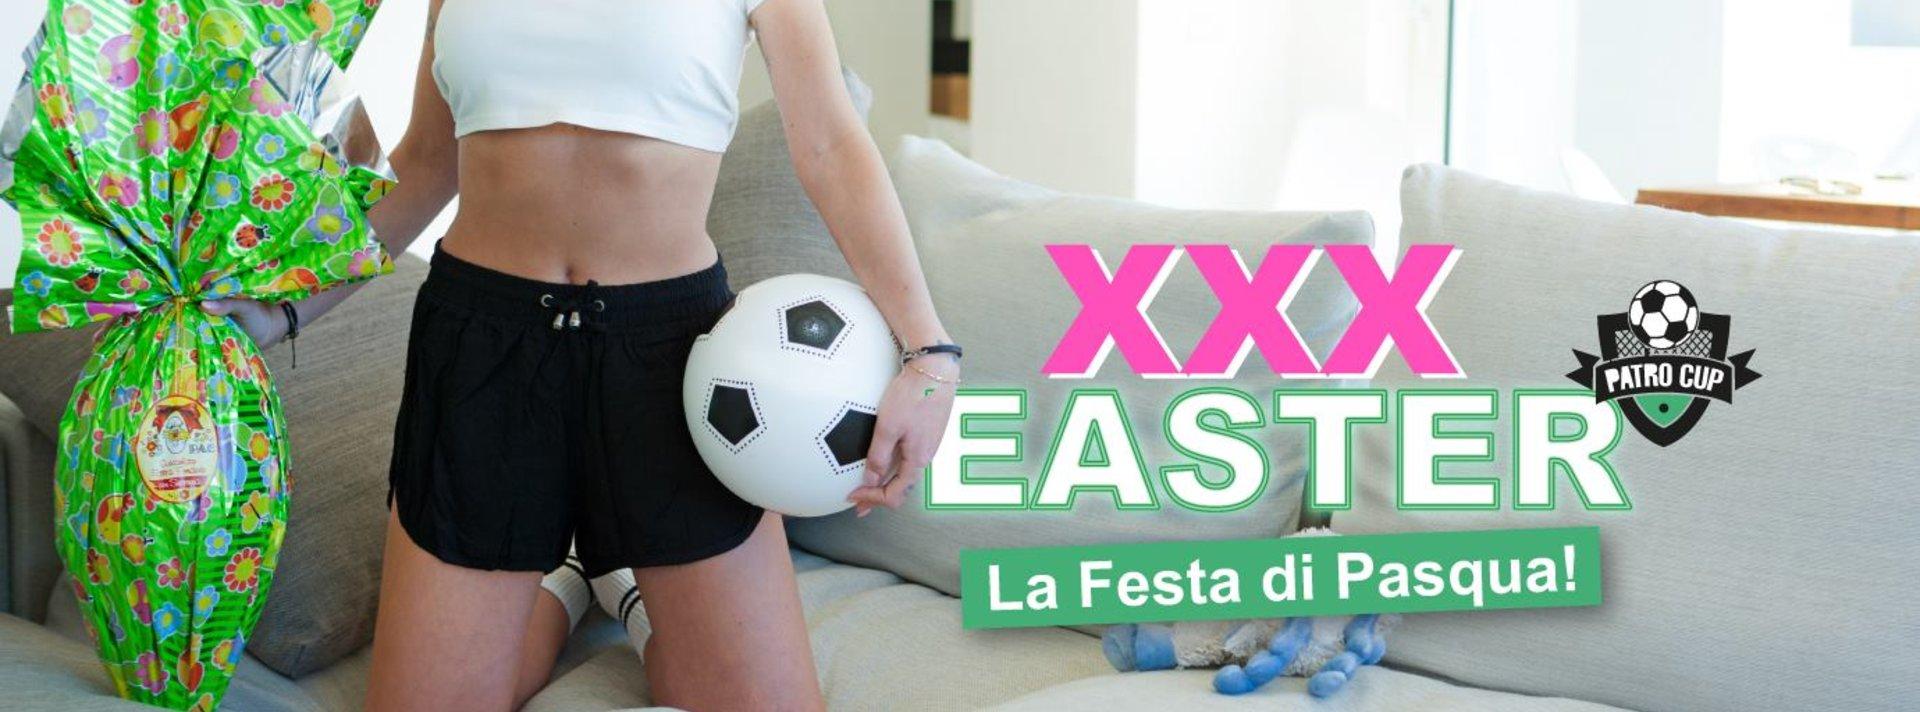 xxx easter 2017 ai Gelsi